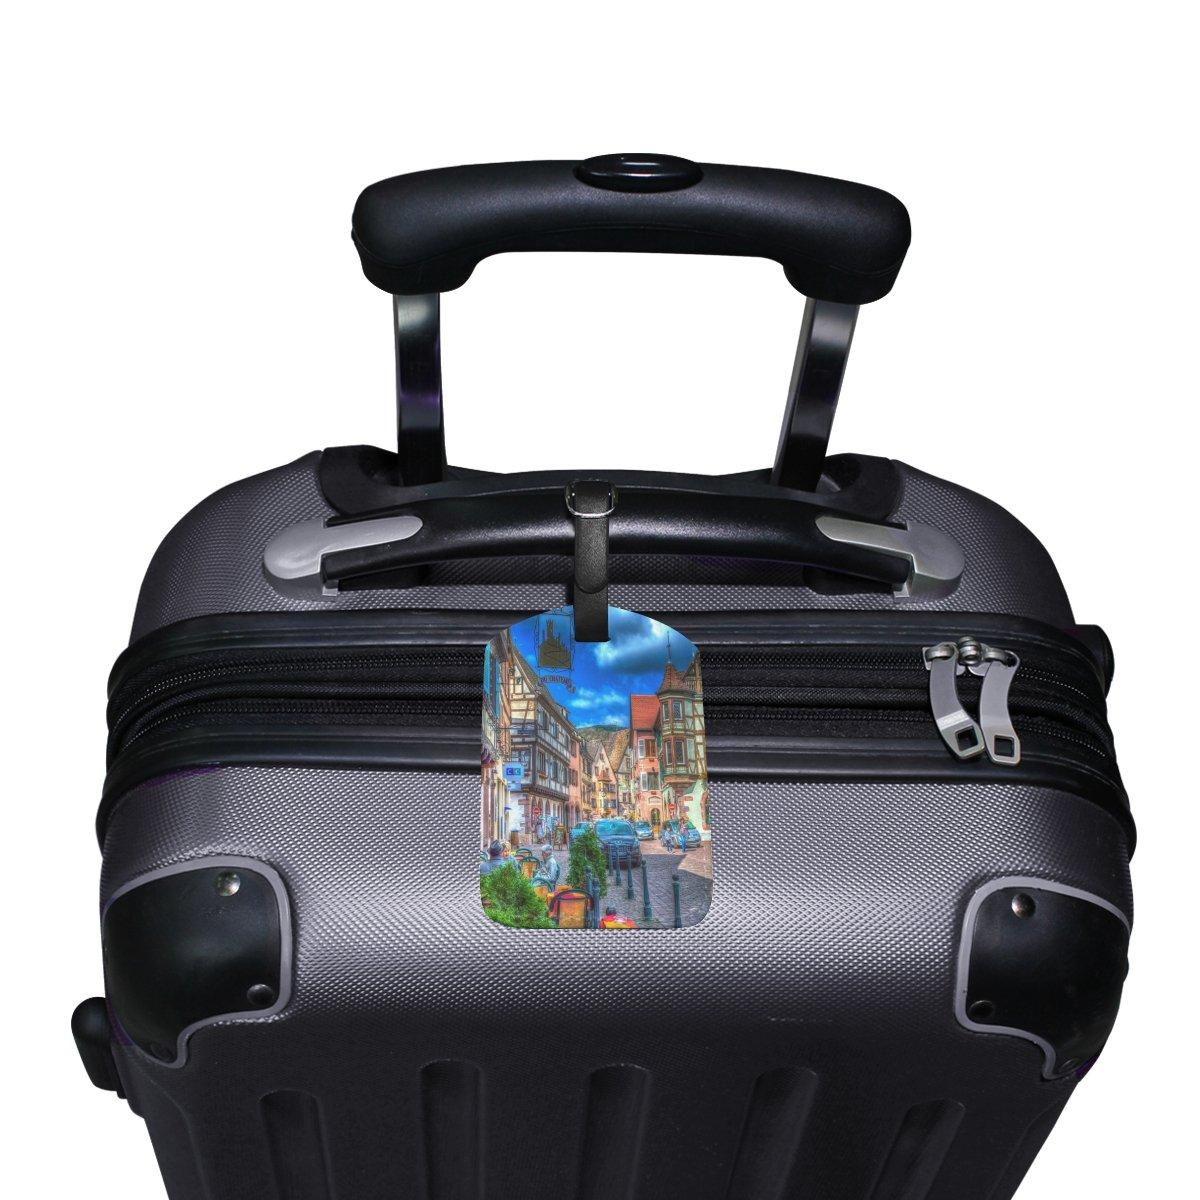 1Pcs Saobao Travel Luggage Tag City PU Leather Baggage Suitcase Travel ID Bag Tag